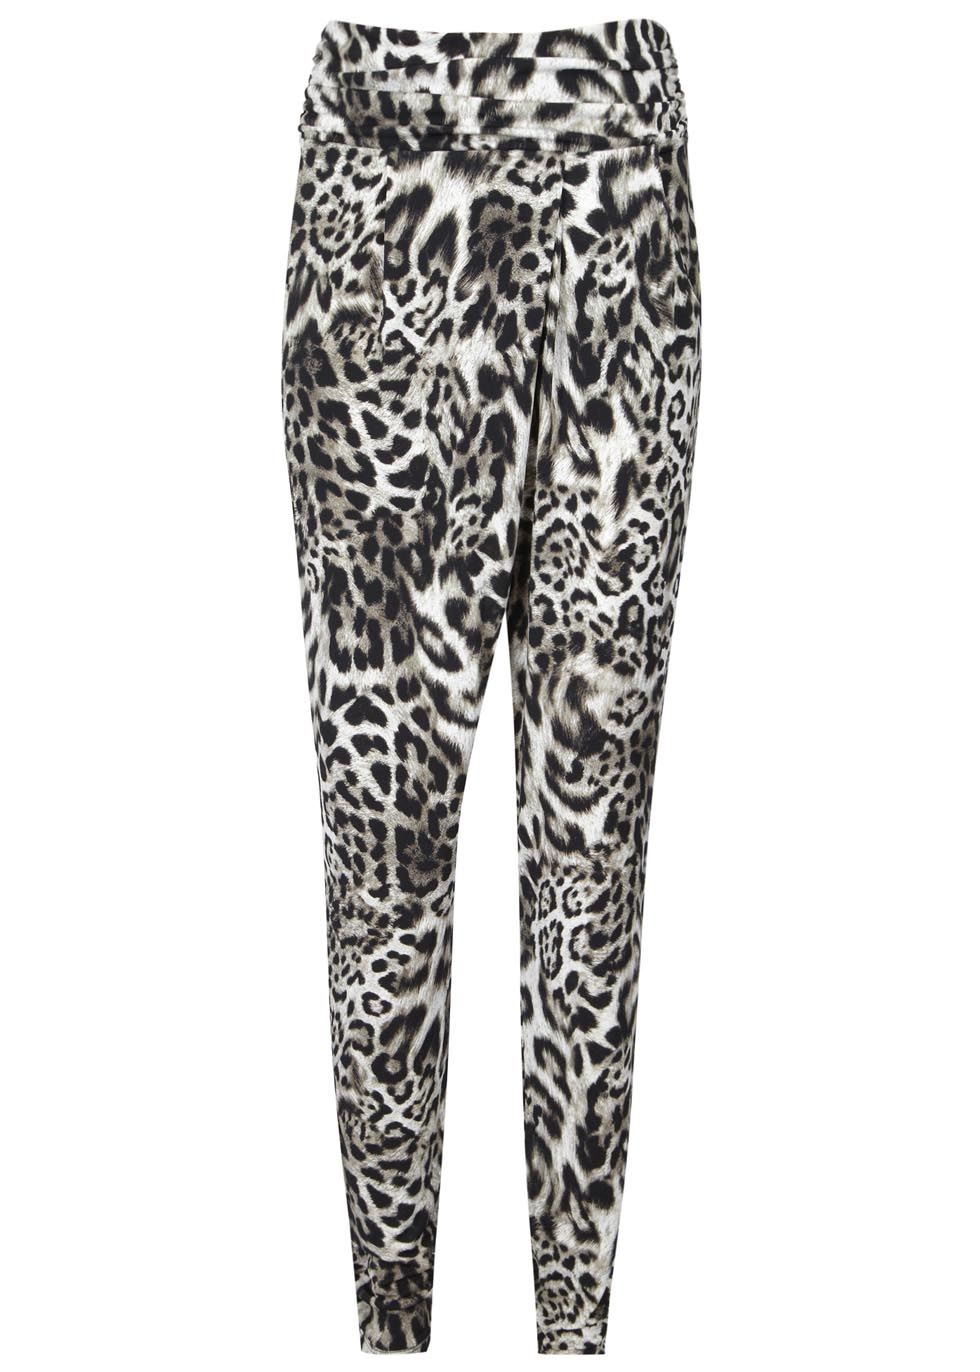 4466c5e556c3a MICHAEL Michael Kors Leopard Print Jersey Trousers in Black - Lyst